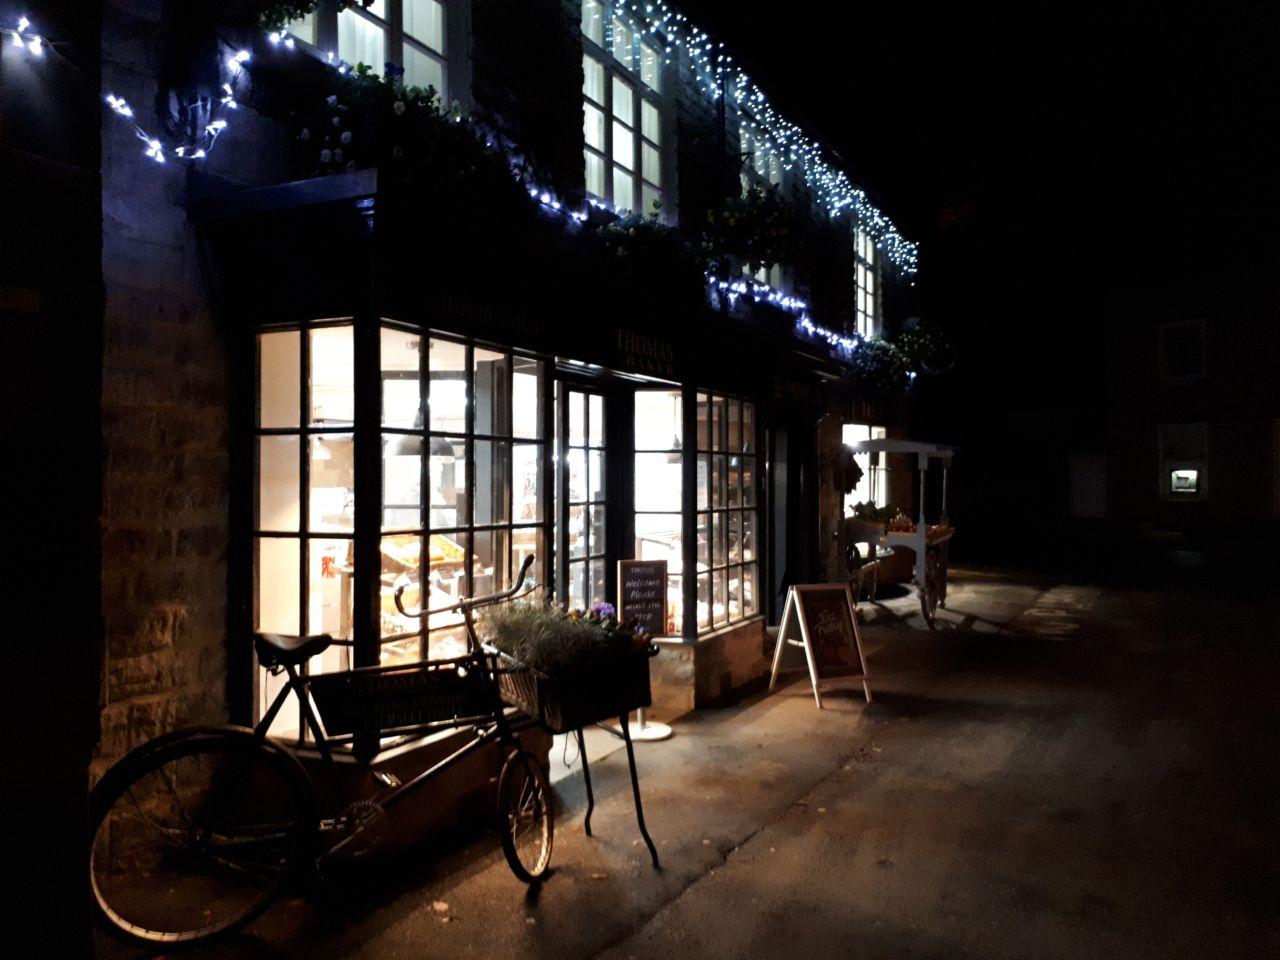 Helmsley Christmas Lights 2017